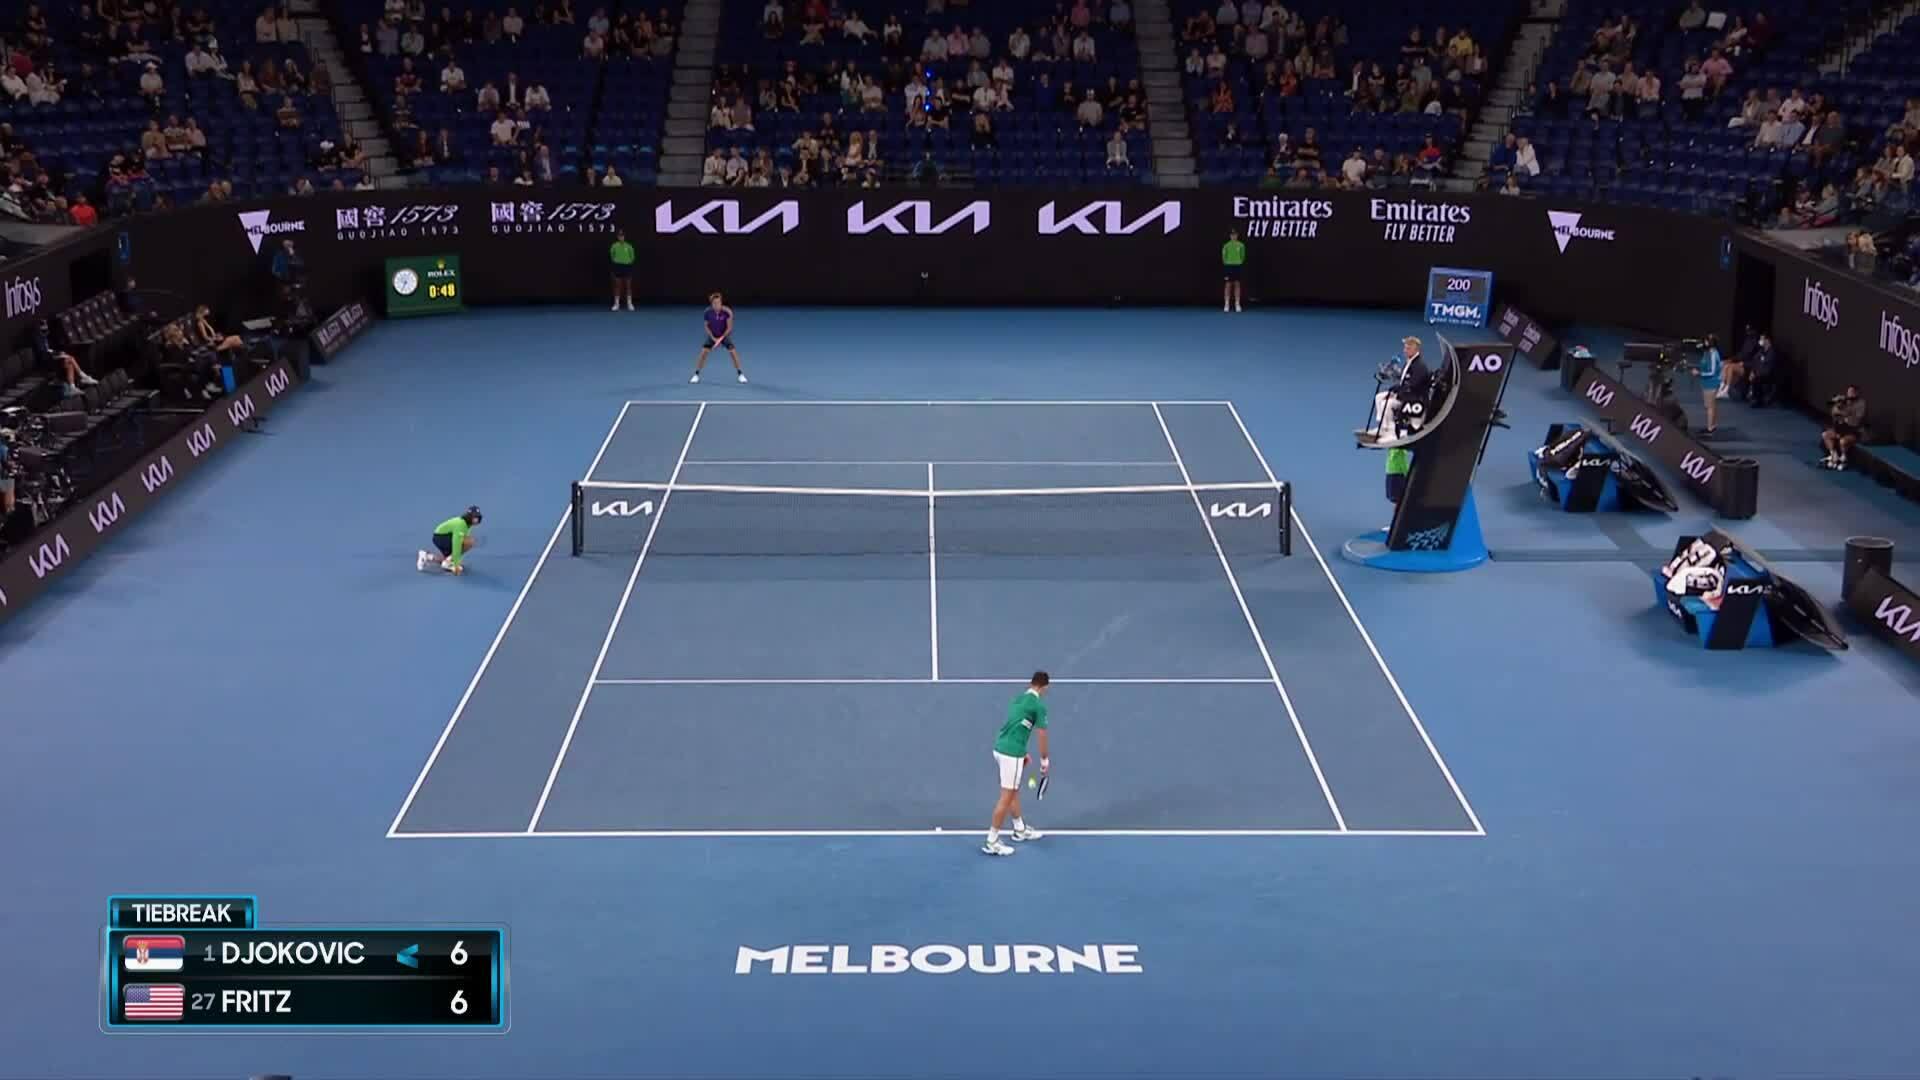 Novak Djokovic 3-2 Taylor Fritz